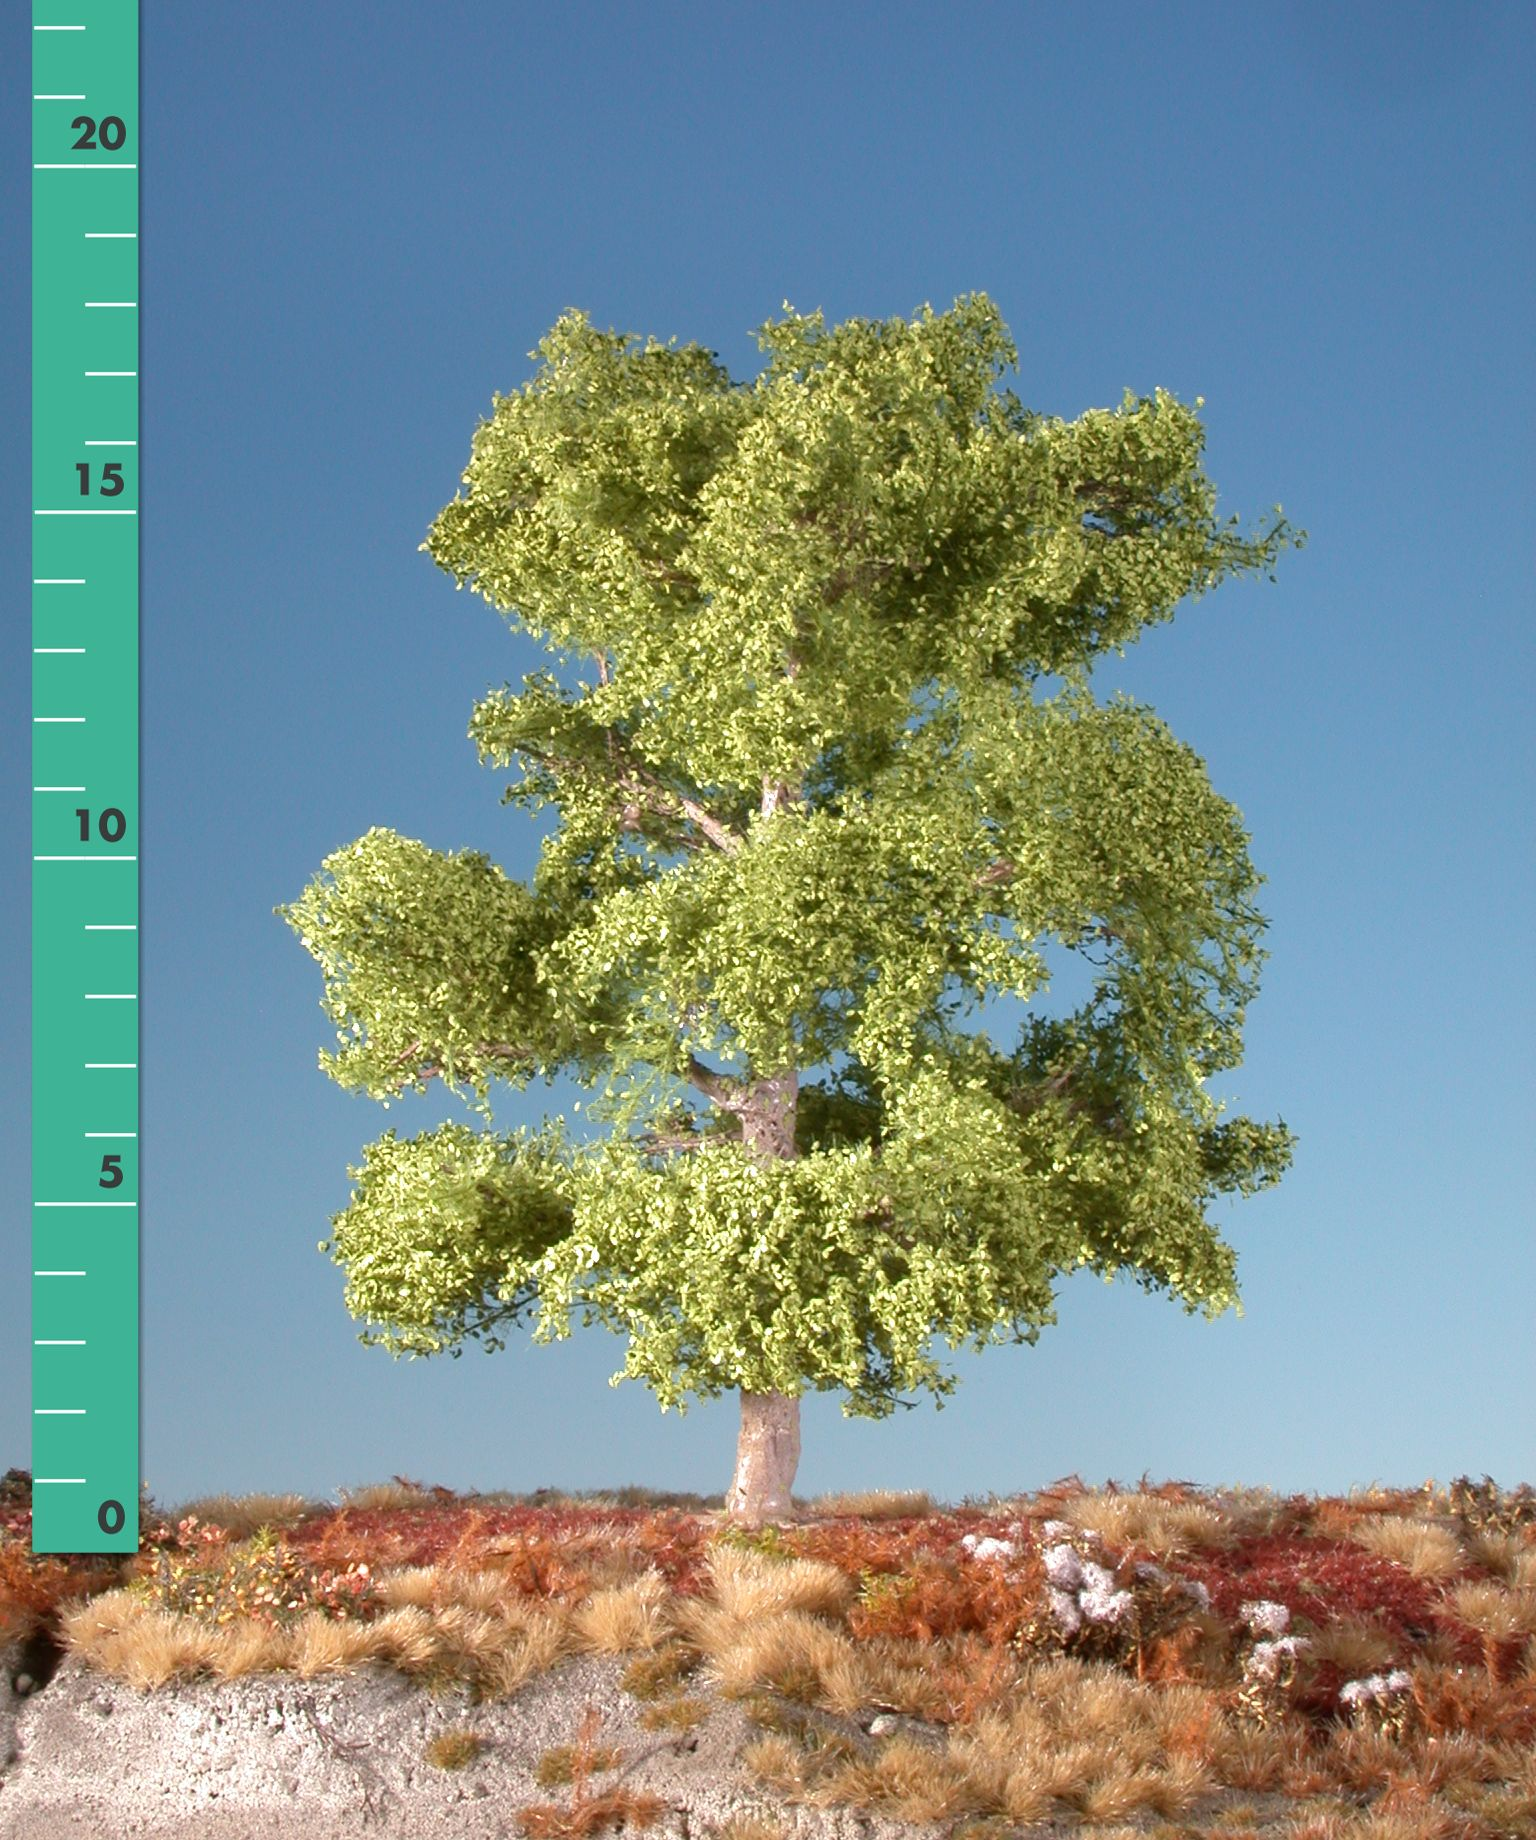 buche 1 45 fr hling modellbaum miniaturmodelle b ume pflanzen belaubung filigranb sche. Black Bedroom Furniture Sets. Home Design Ideas